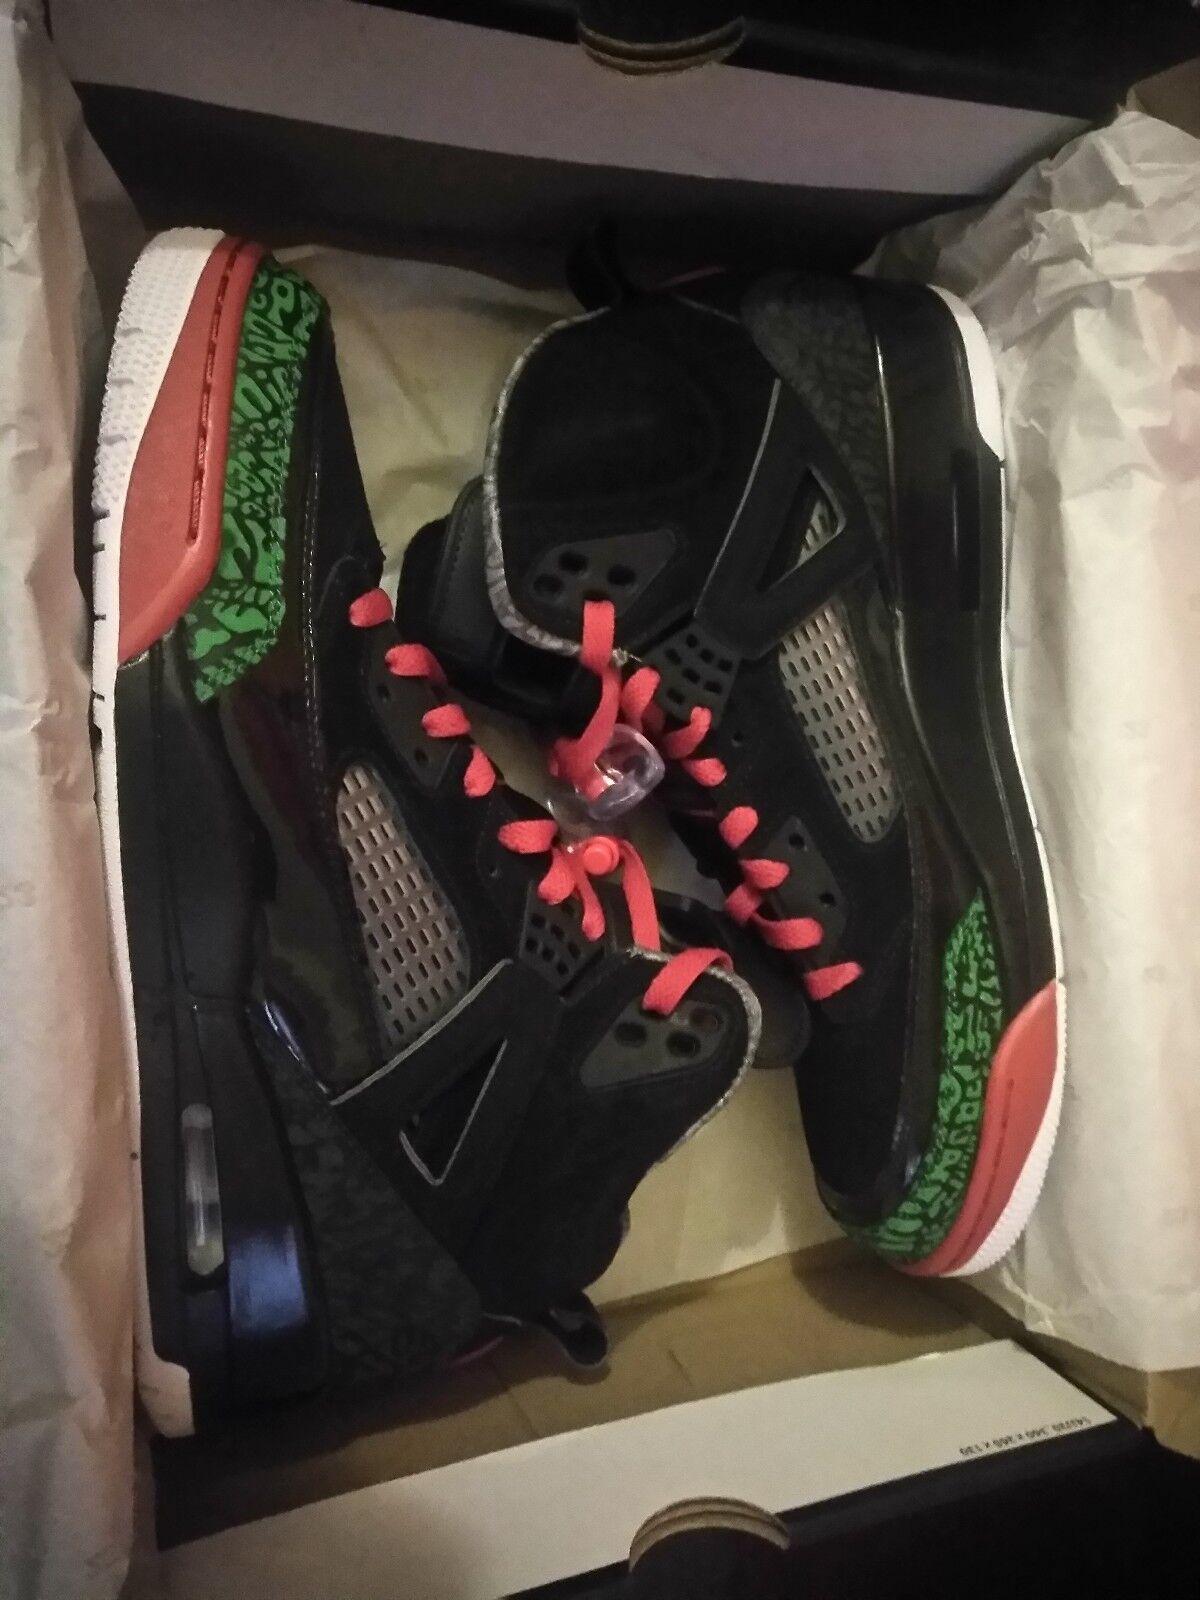 Jordan Spizike Size 11 USA MEN'S